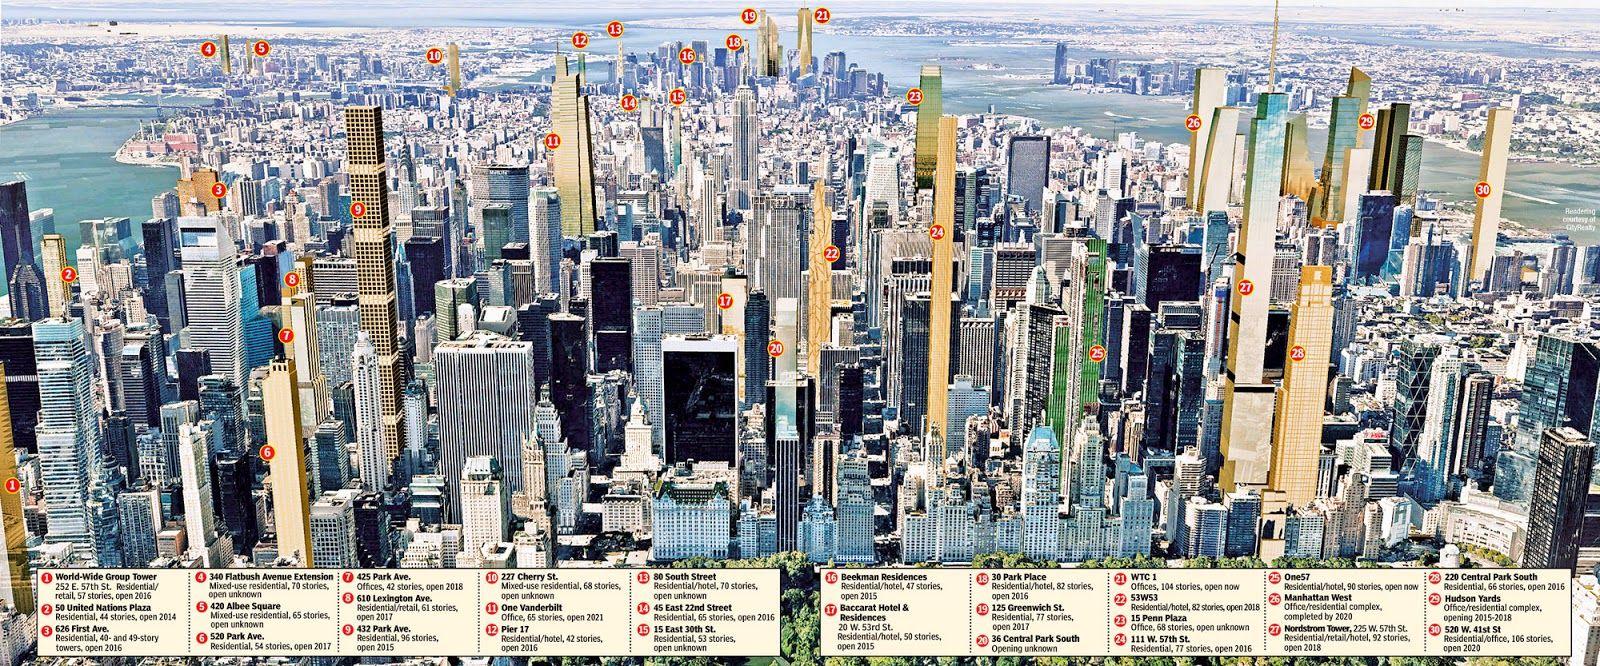 New Manhattan Skyscrapers Map Locations In 2020 Skyline Nyc Skyline New York Skyline